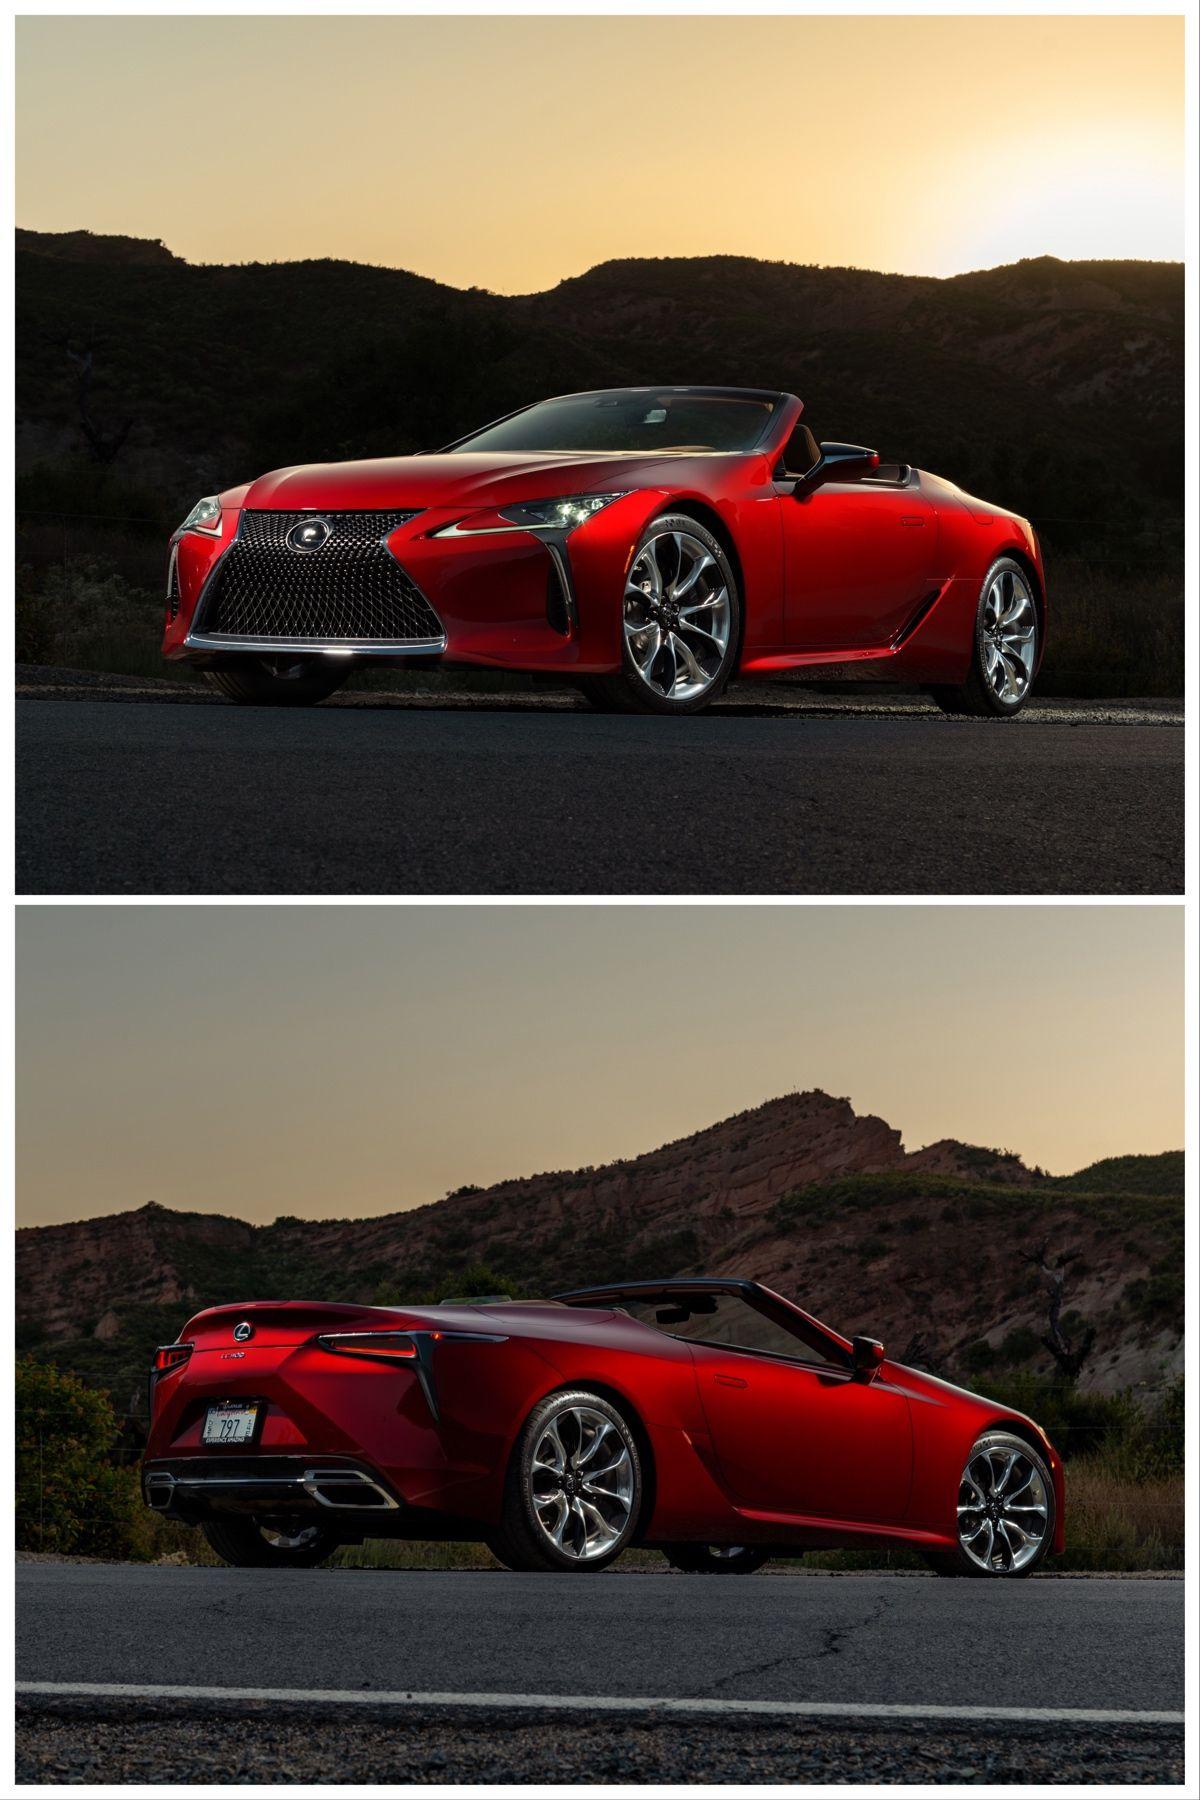 2021 Lexus Lc500 Convertible First Test Drive In 2020 Lexus Lexus Lc Convertible